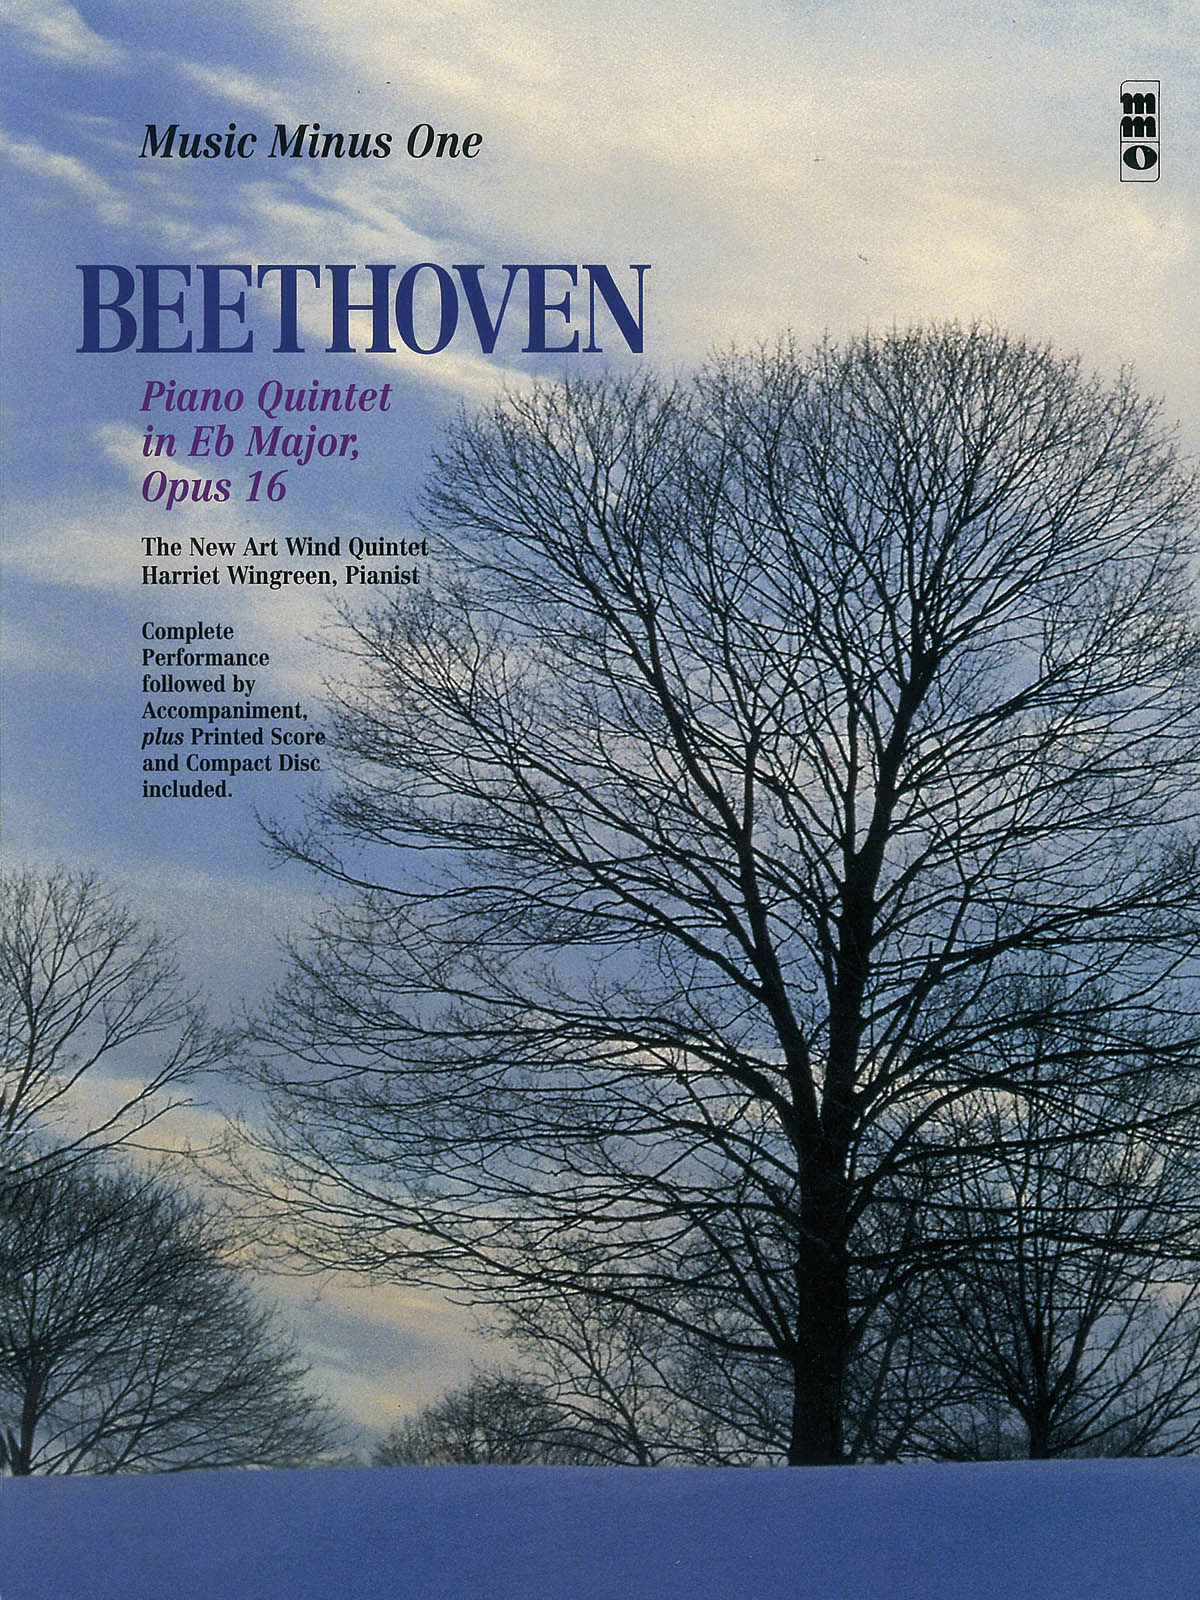 Ludwig van Beethoven: Piano Quintet in E-flat Major  Op. 16: Oboe Solo: